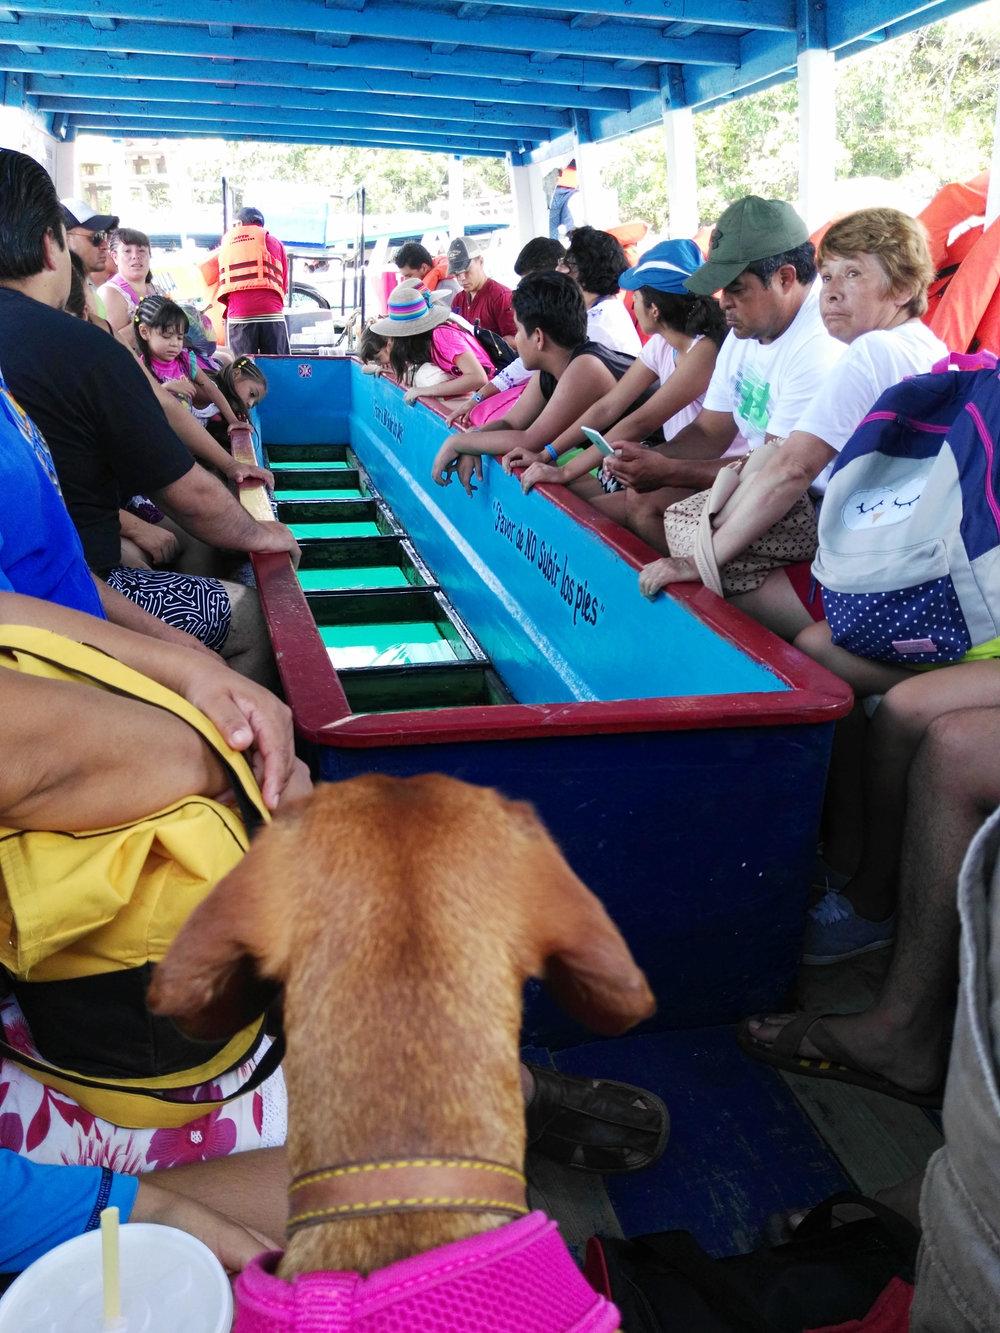 acapulco3.jpg